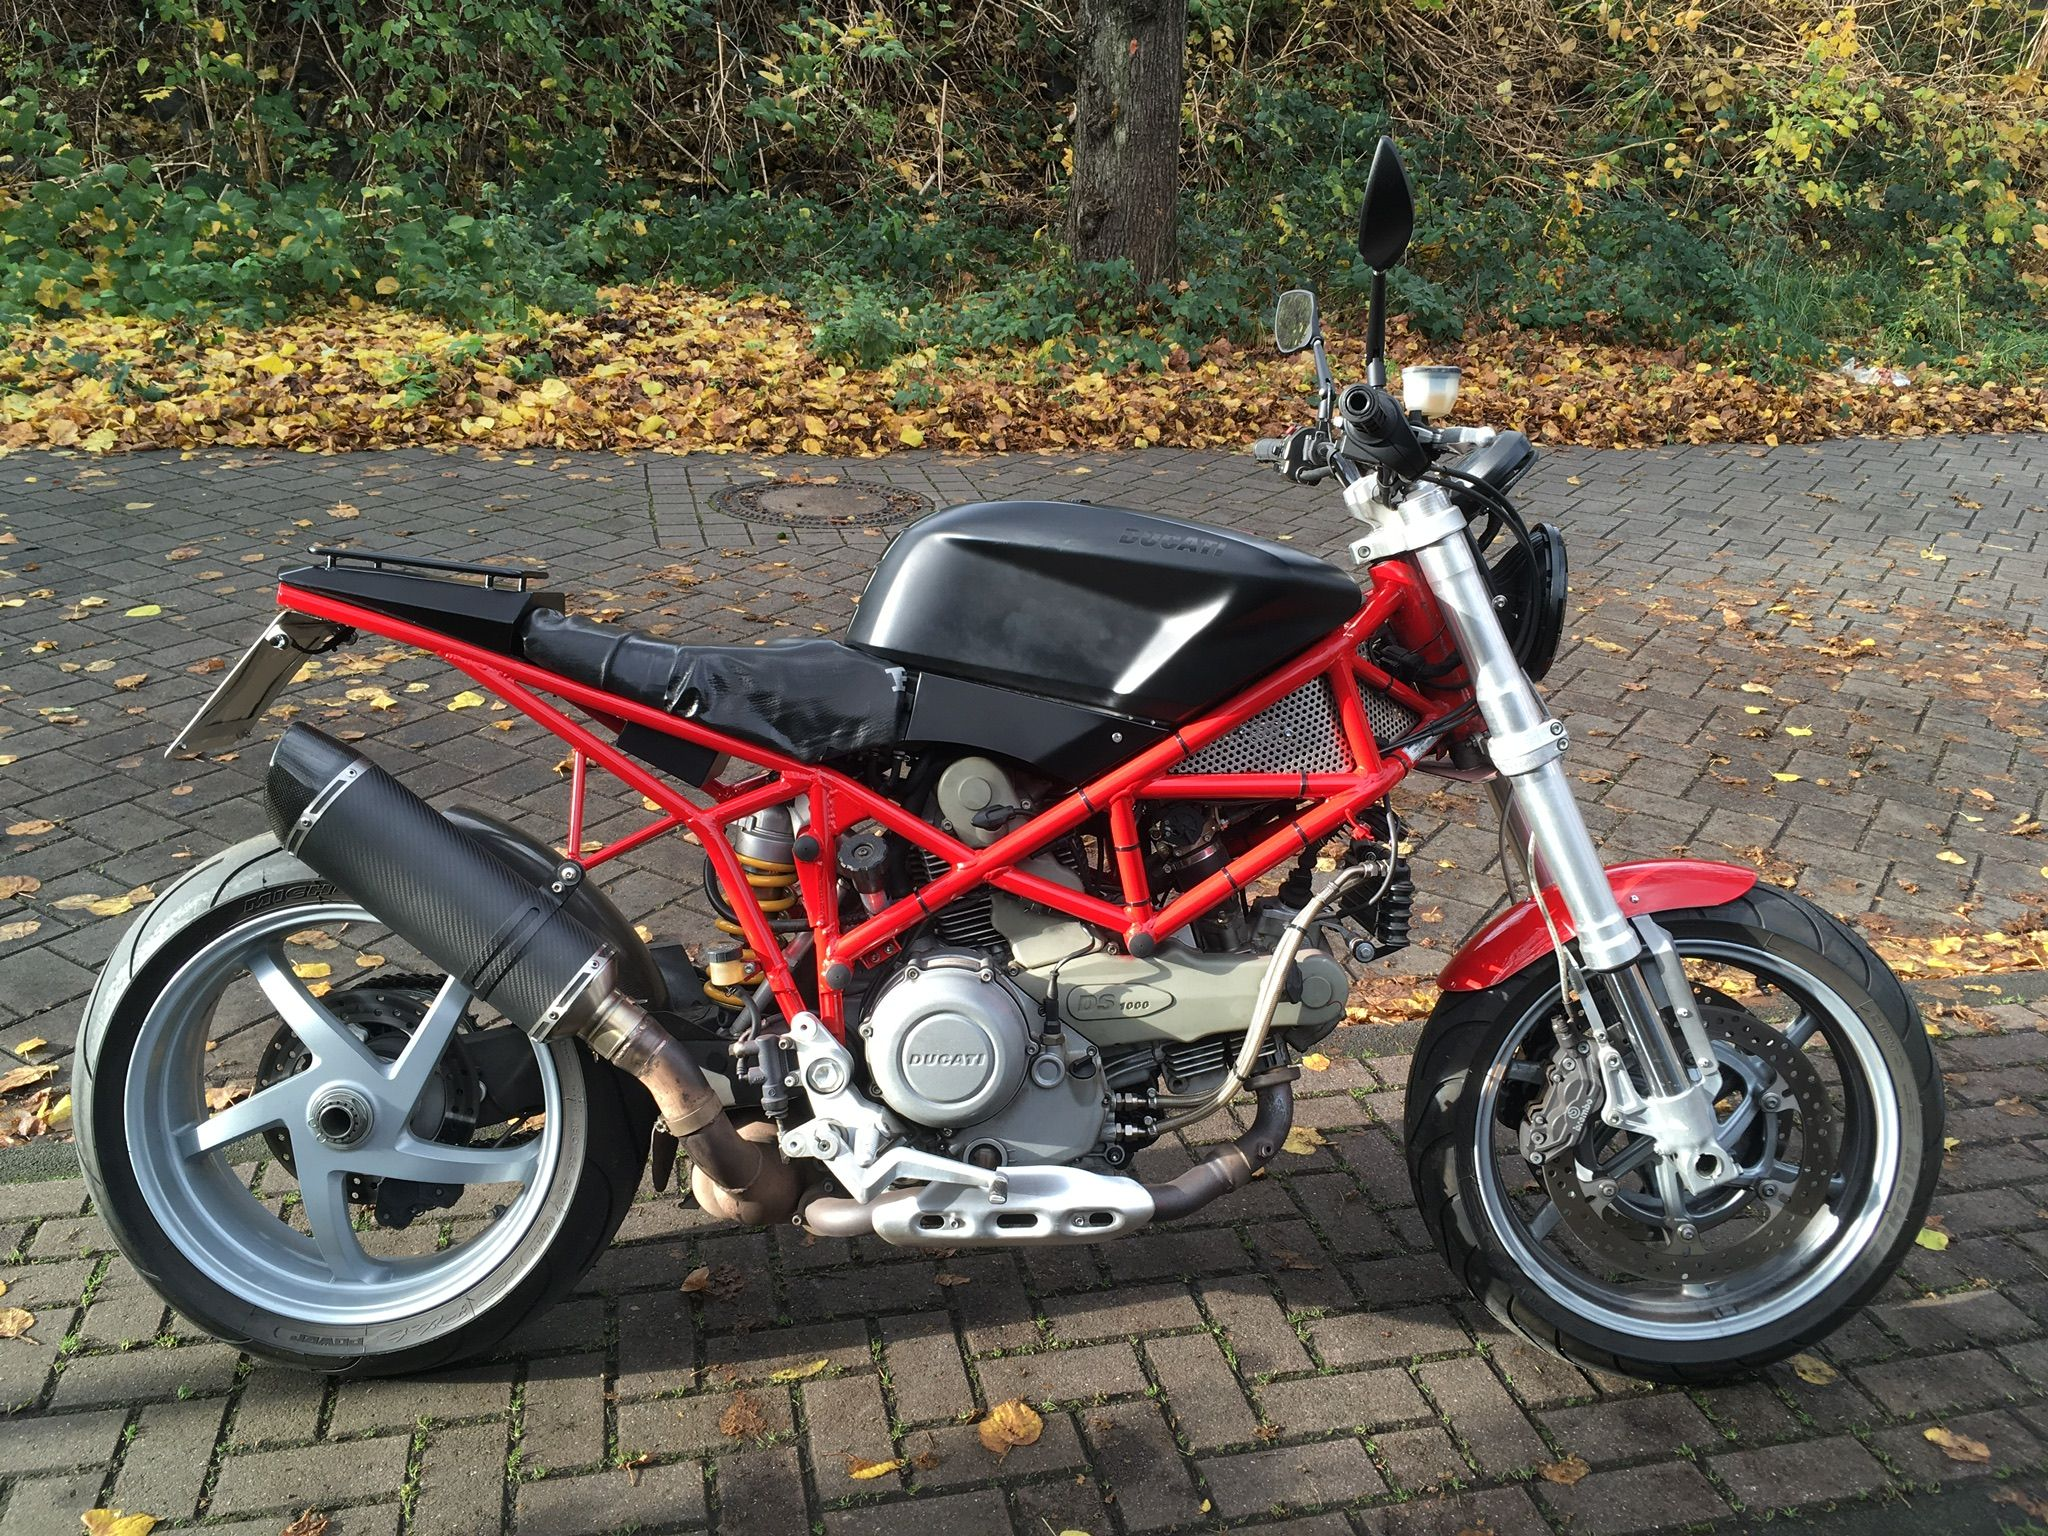 Multistrada GT | Ducati, Motorcycle, Bike